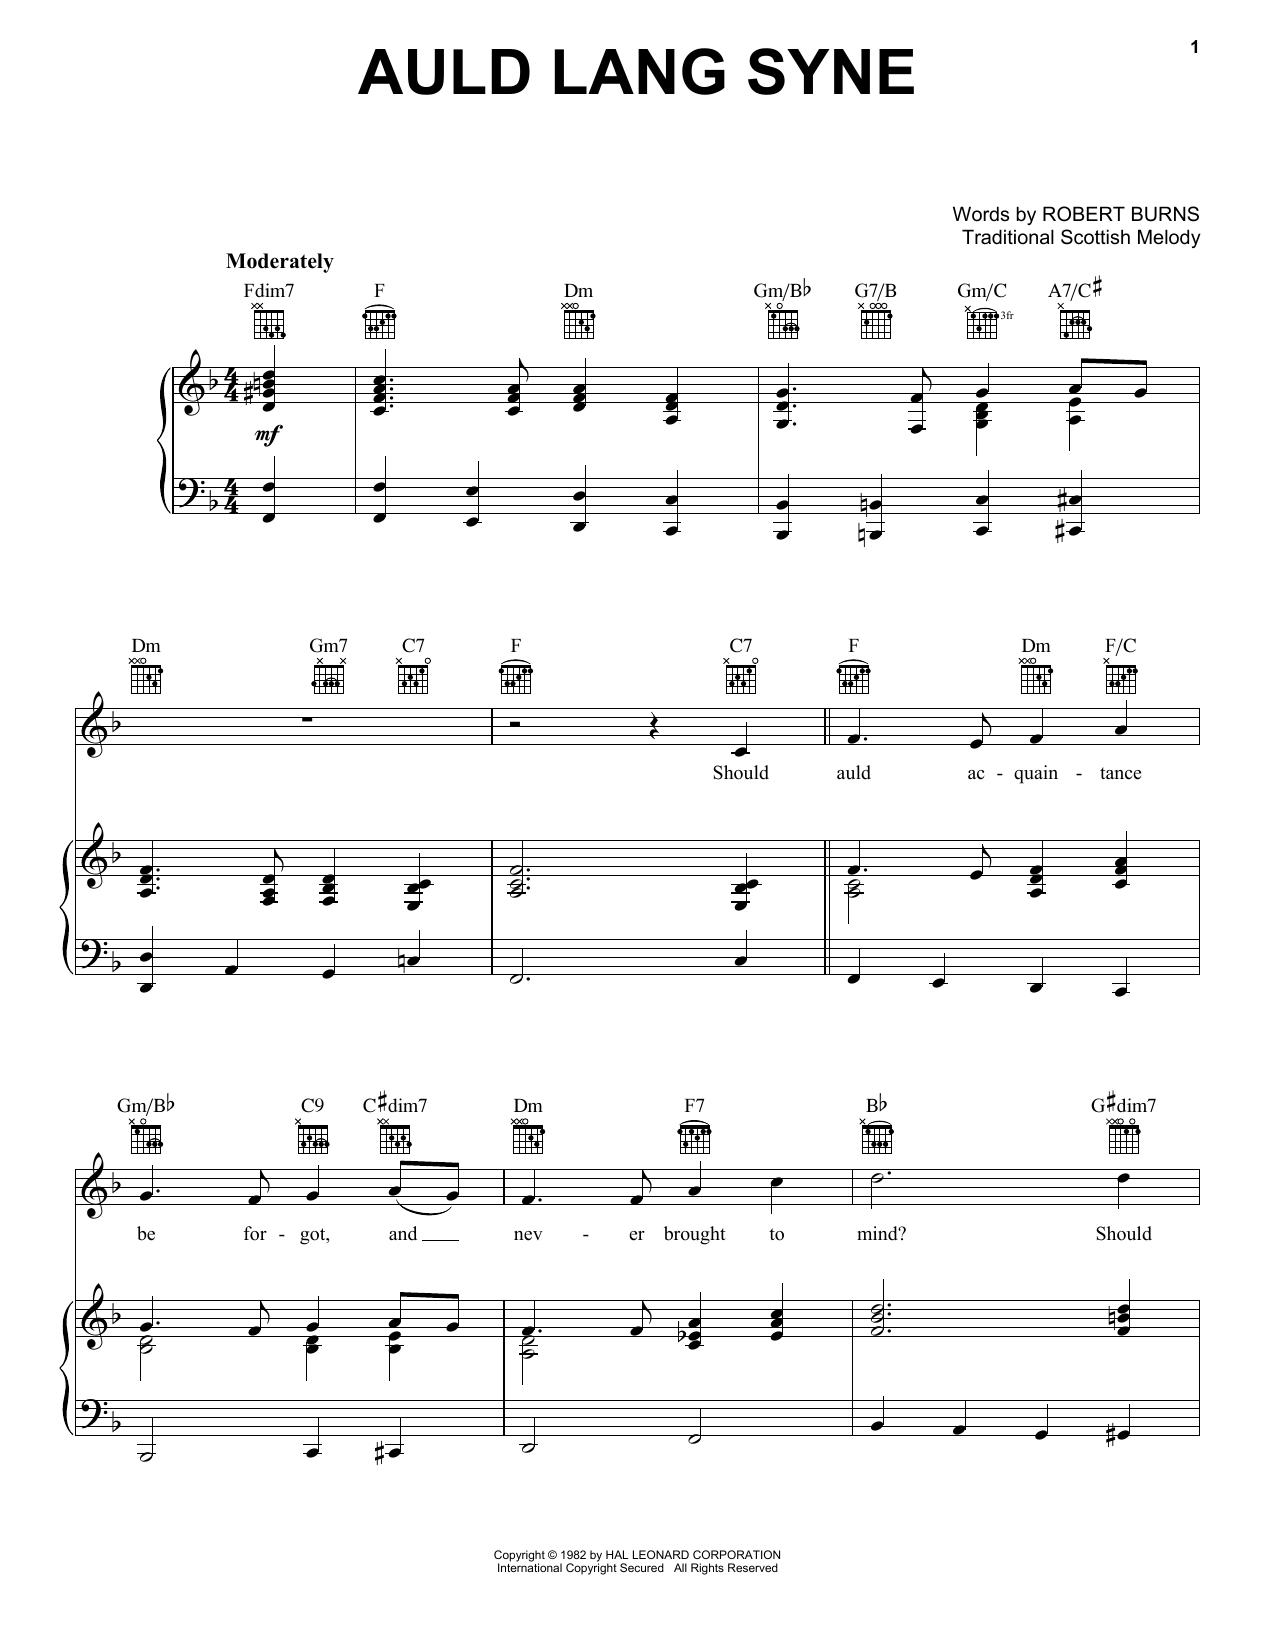 Robert Burns Auld Lang Syne sheet music notes and chords